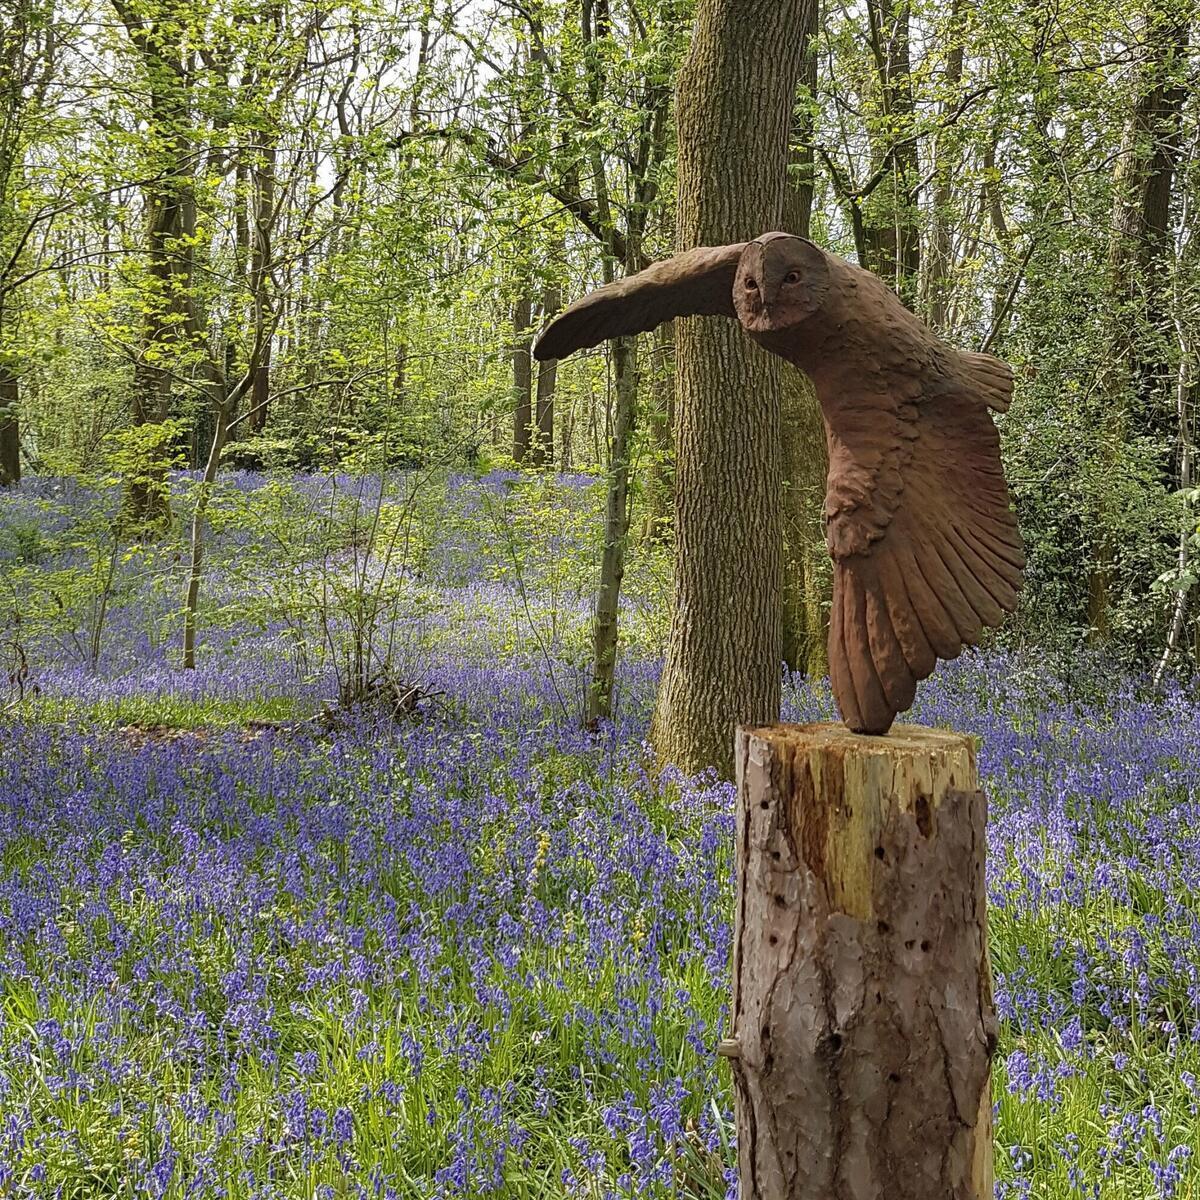 The owl sculpture amongst the bluebells